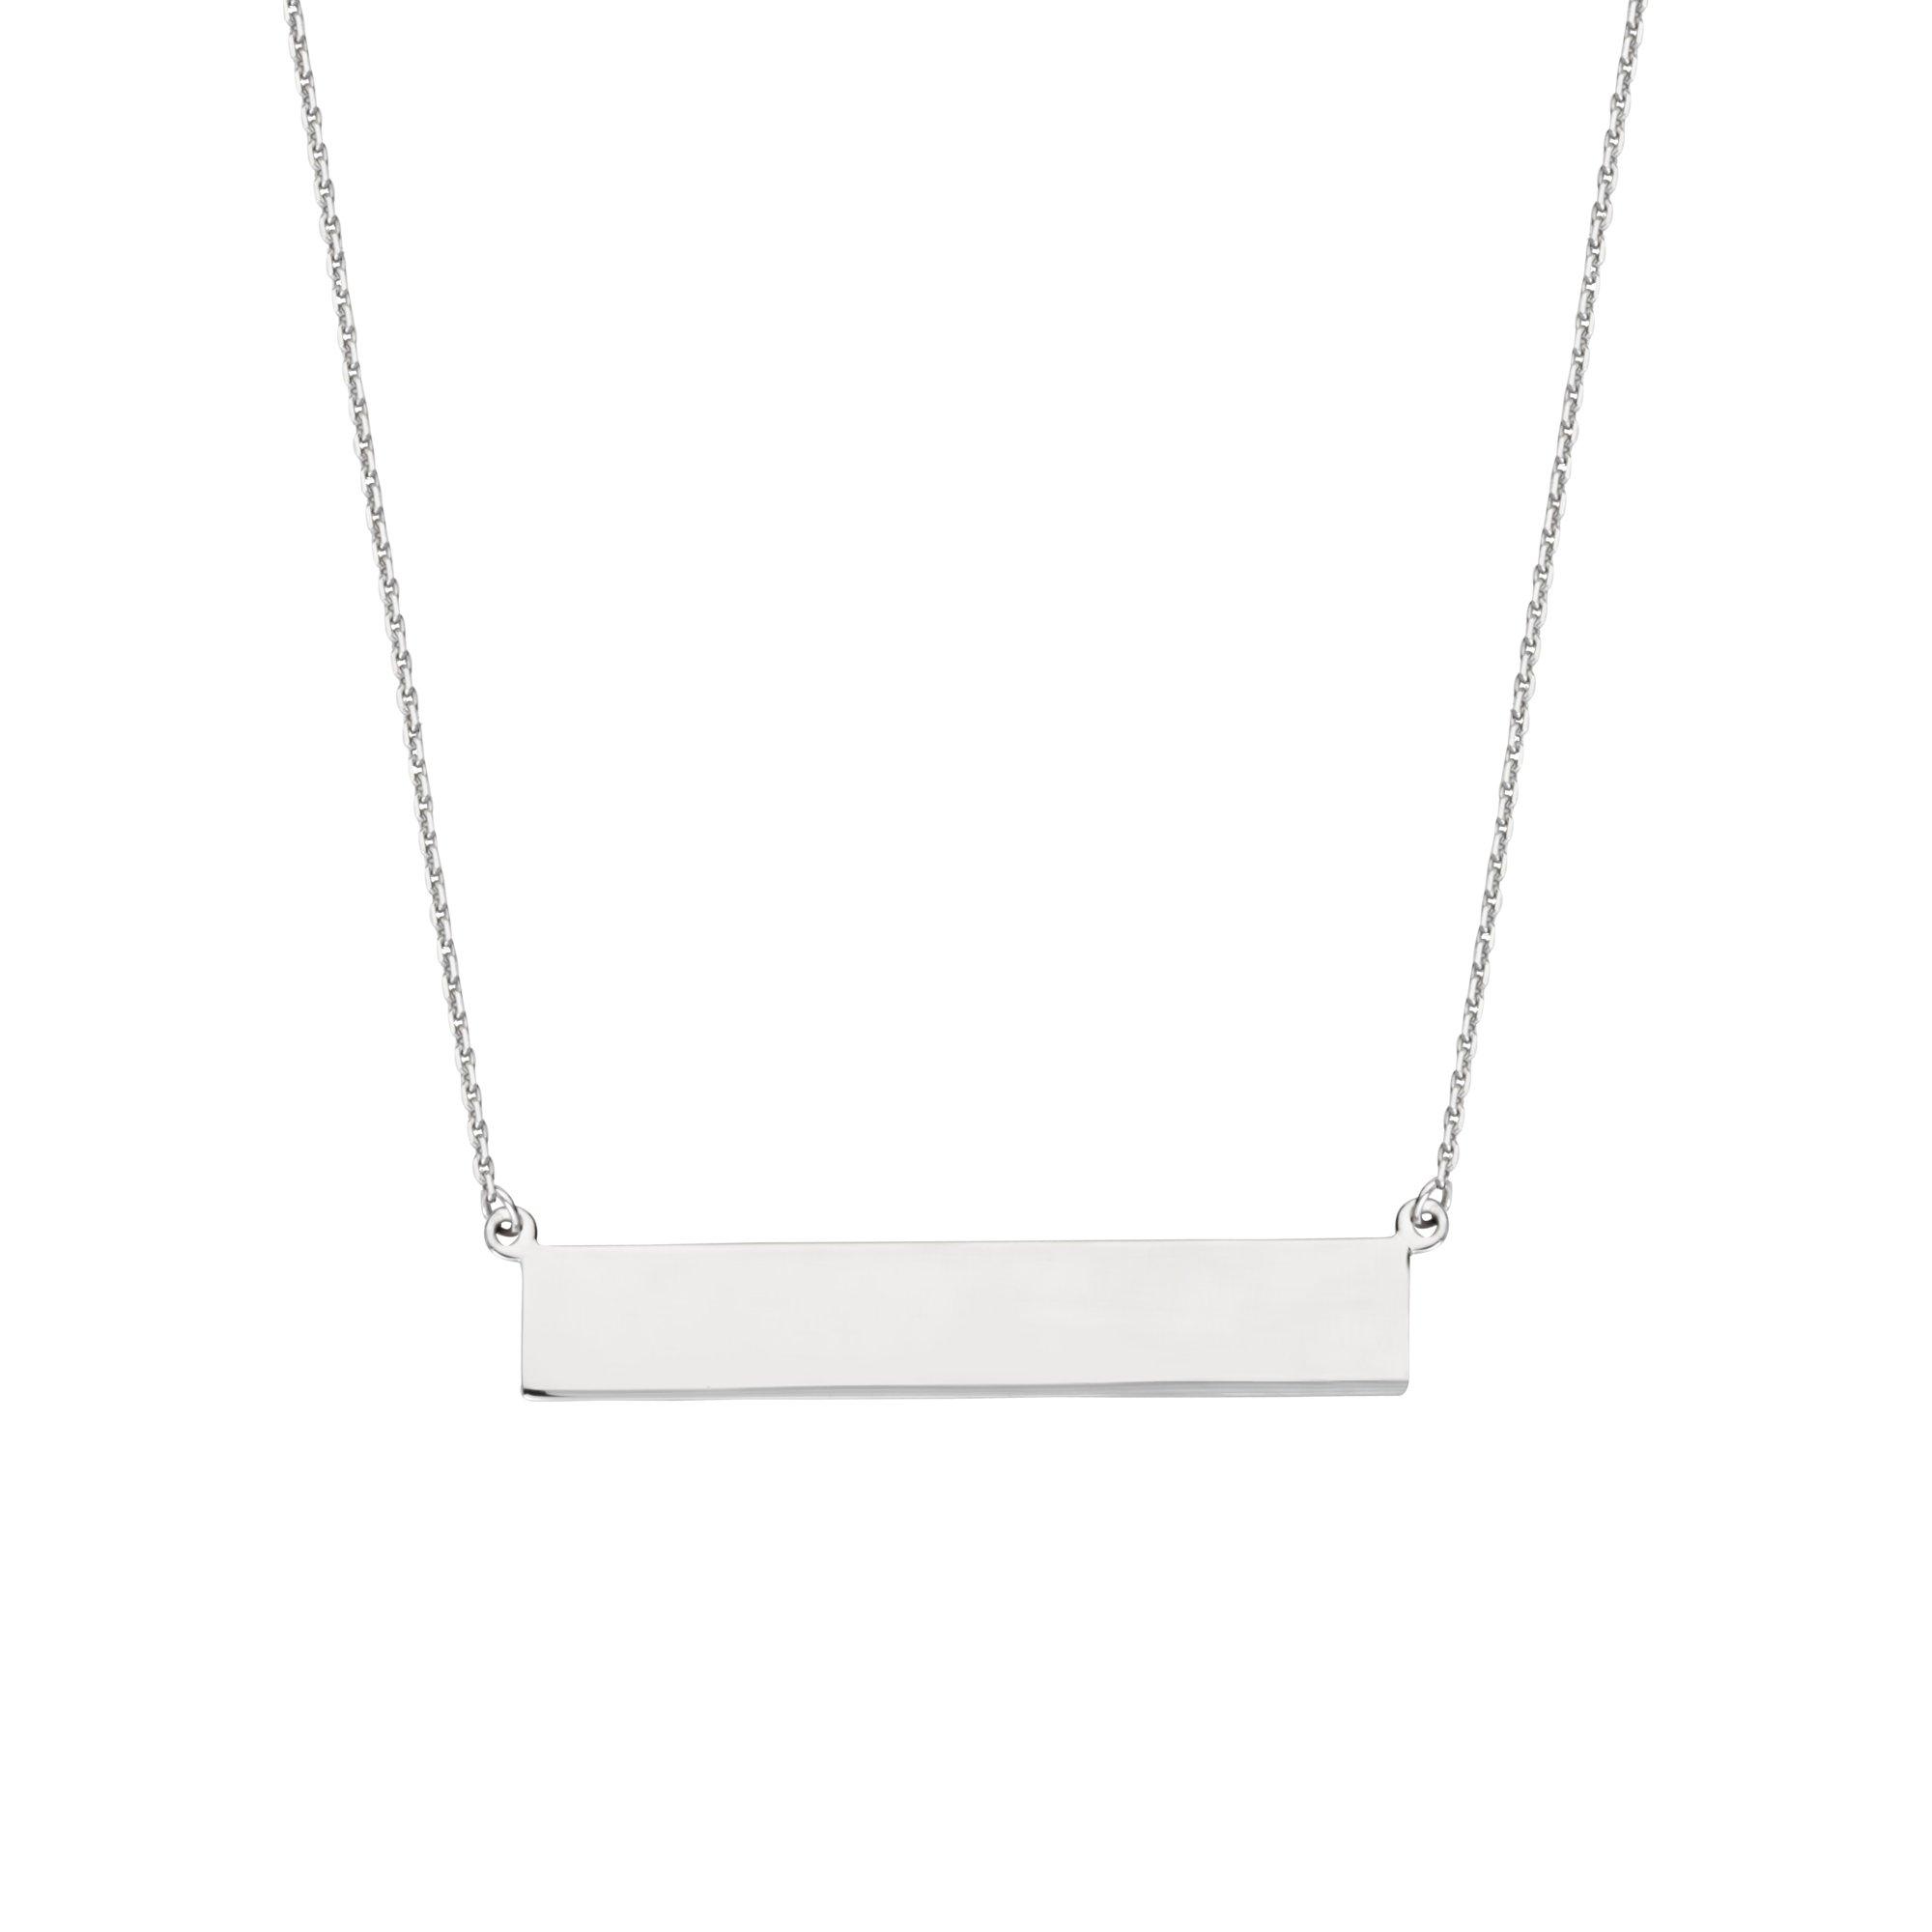 DiamondJewelryNY Silver Pendant, E2W Adj Name Plate Neck